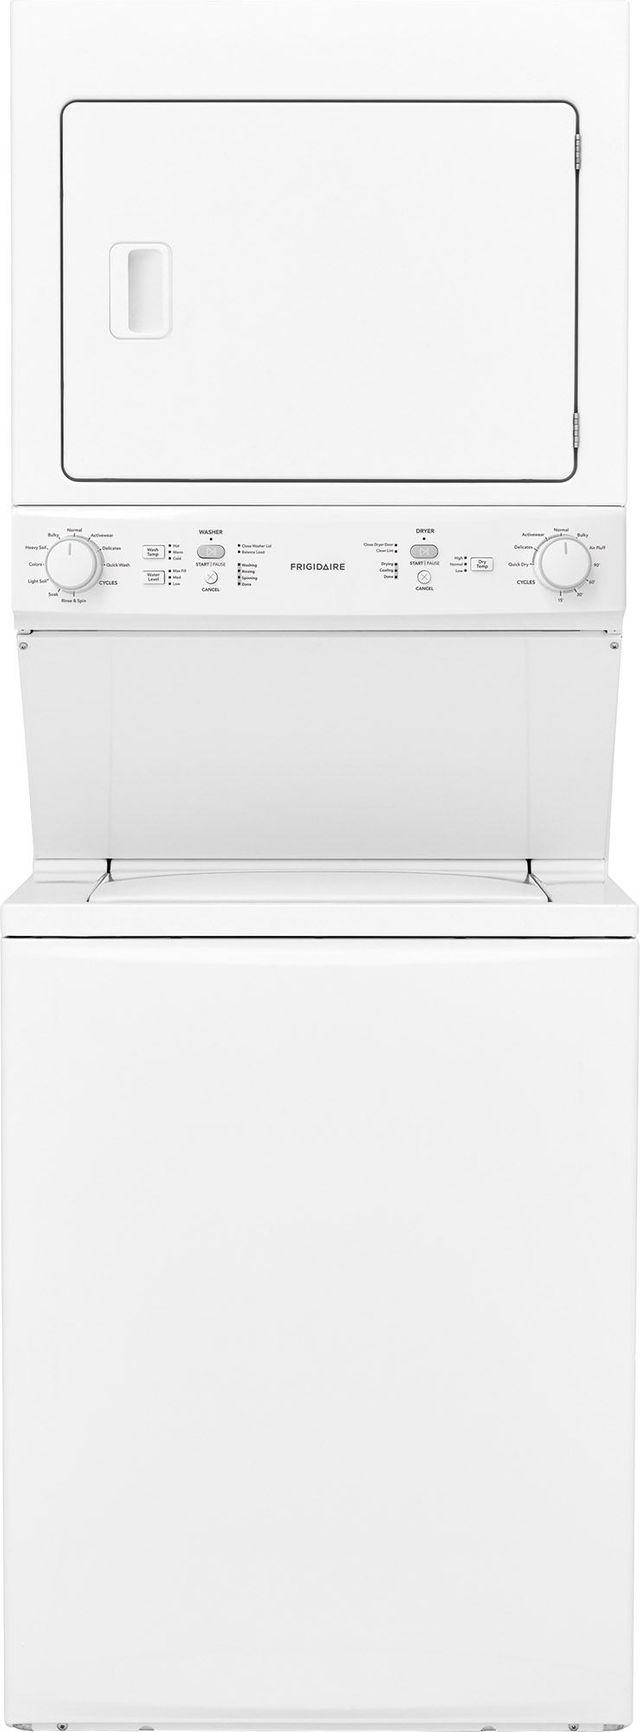 Frigidaire 174 3 9 Cu Ft Washer 5 5 Cu Ft Dryer White